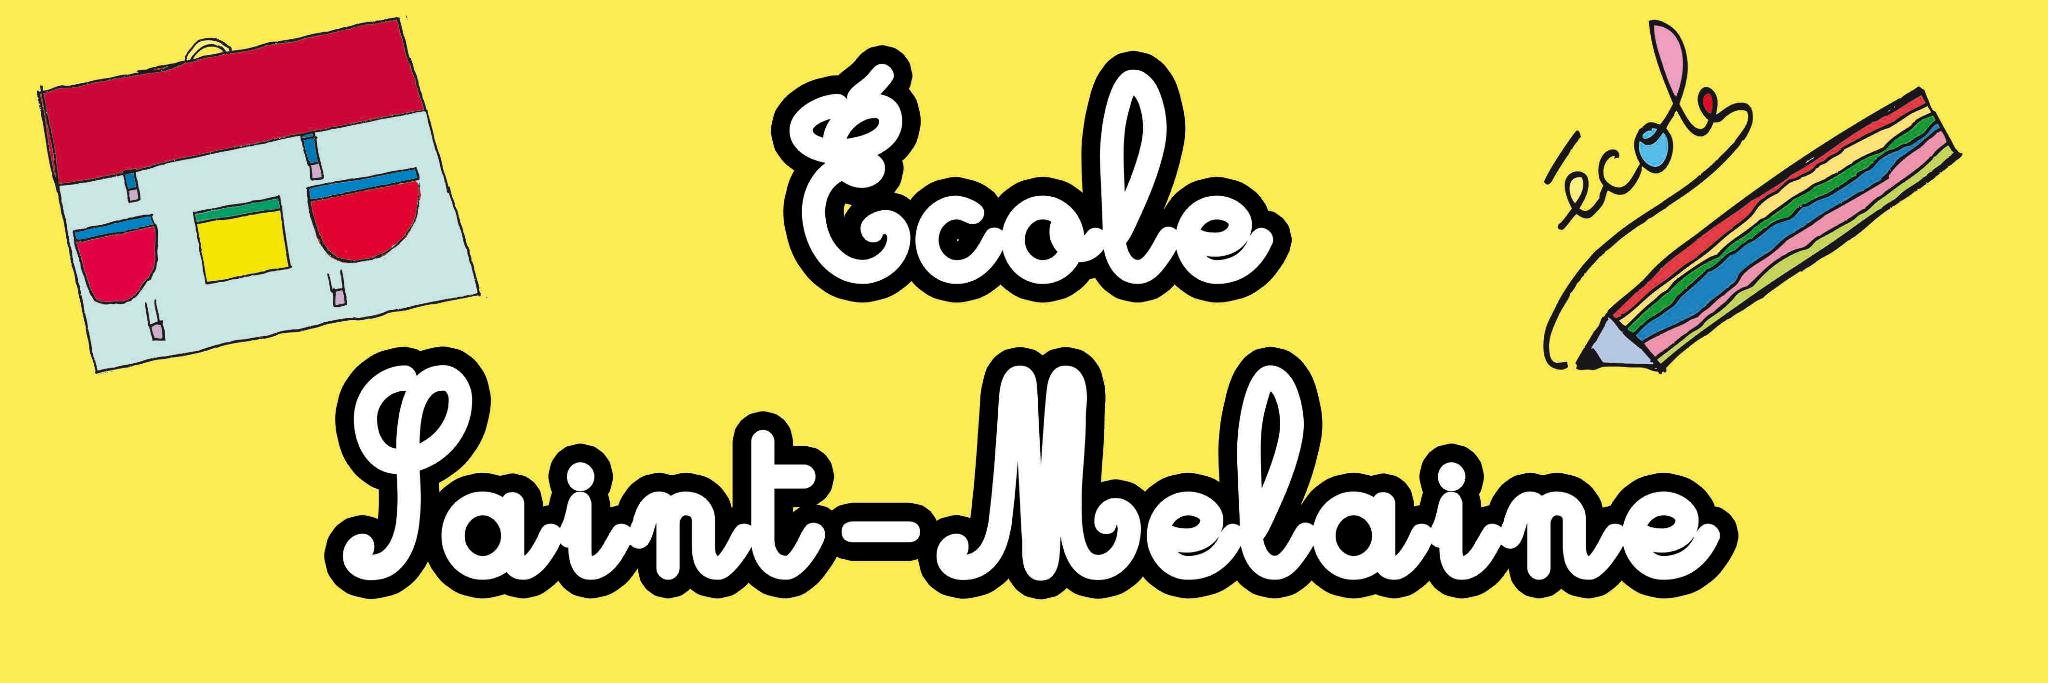 ecole-saint-melaine